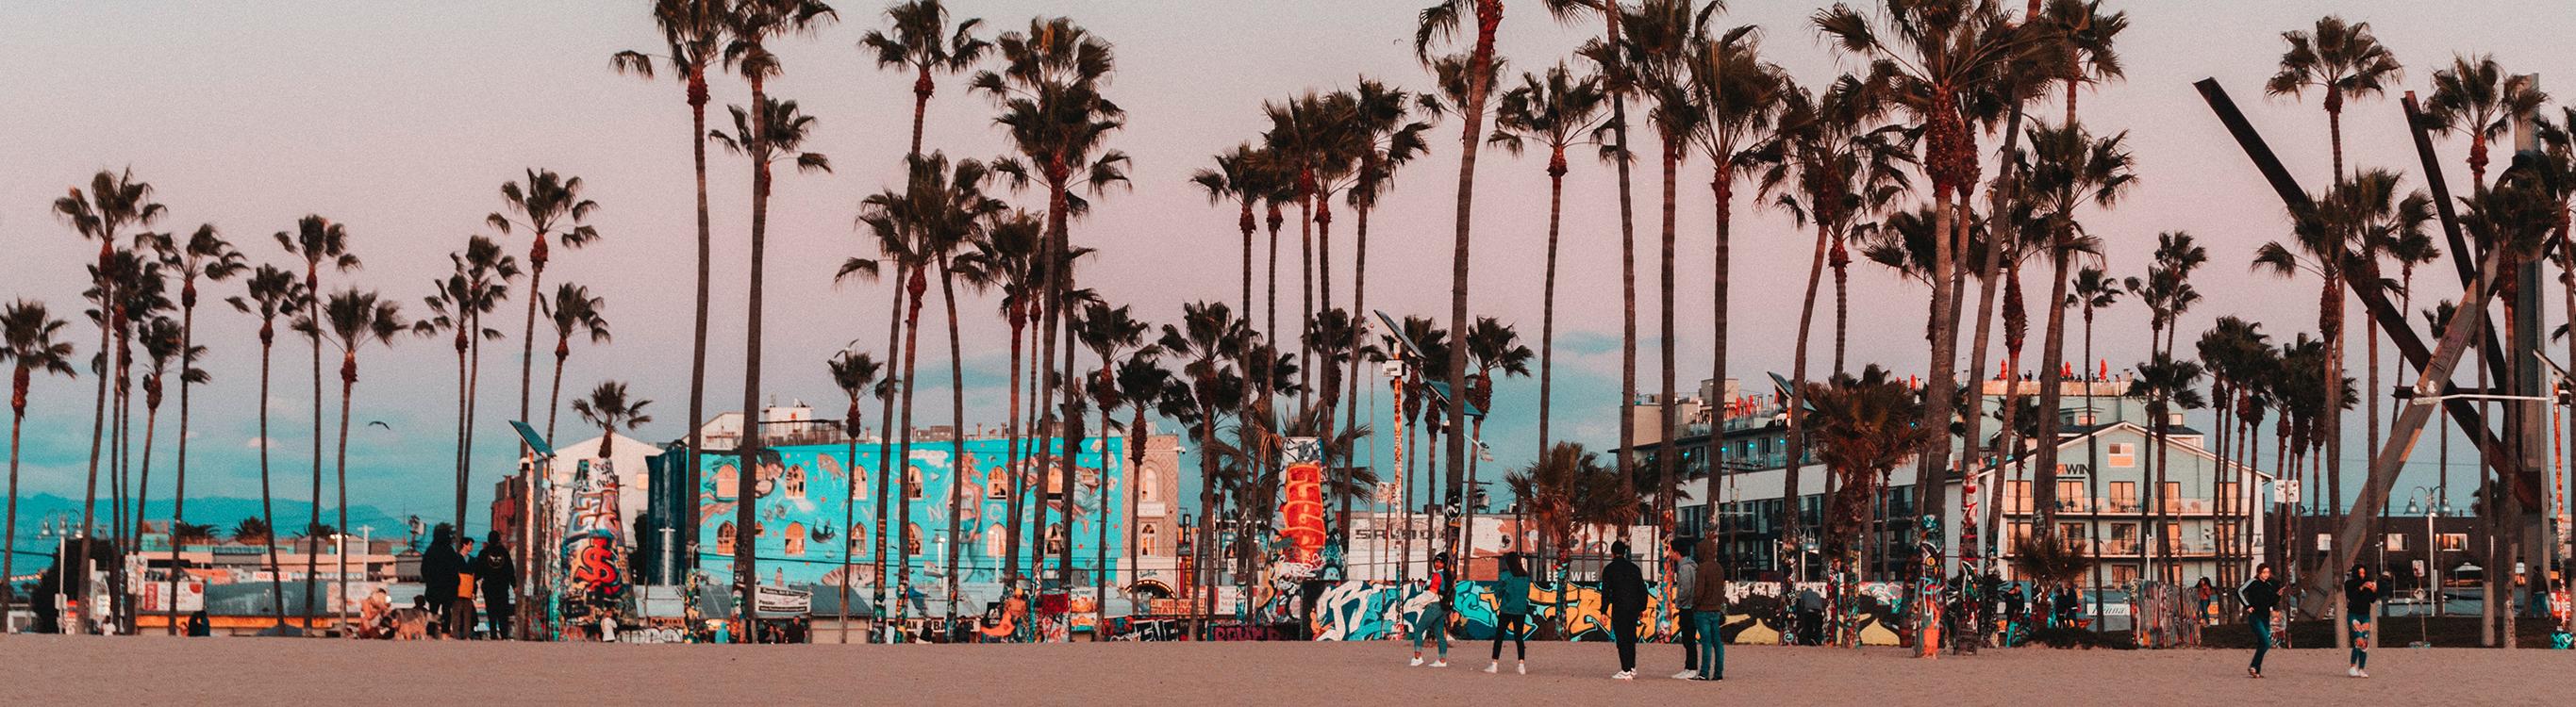 Party Bike Santa Monica - The #1 Santa Monica Pedal Pub Crawl